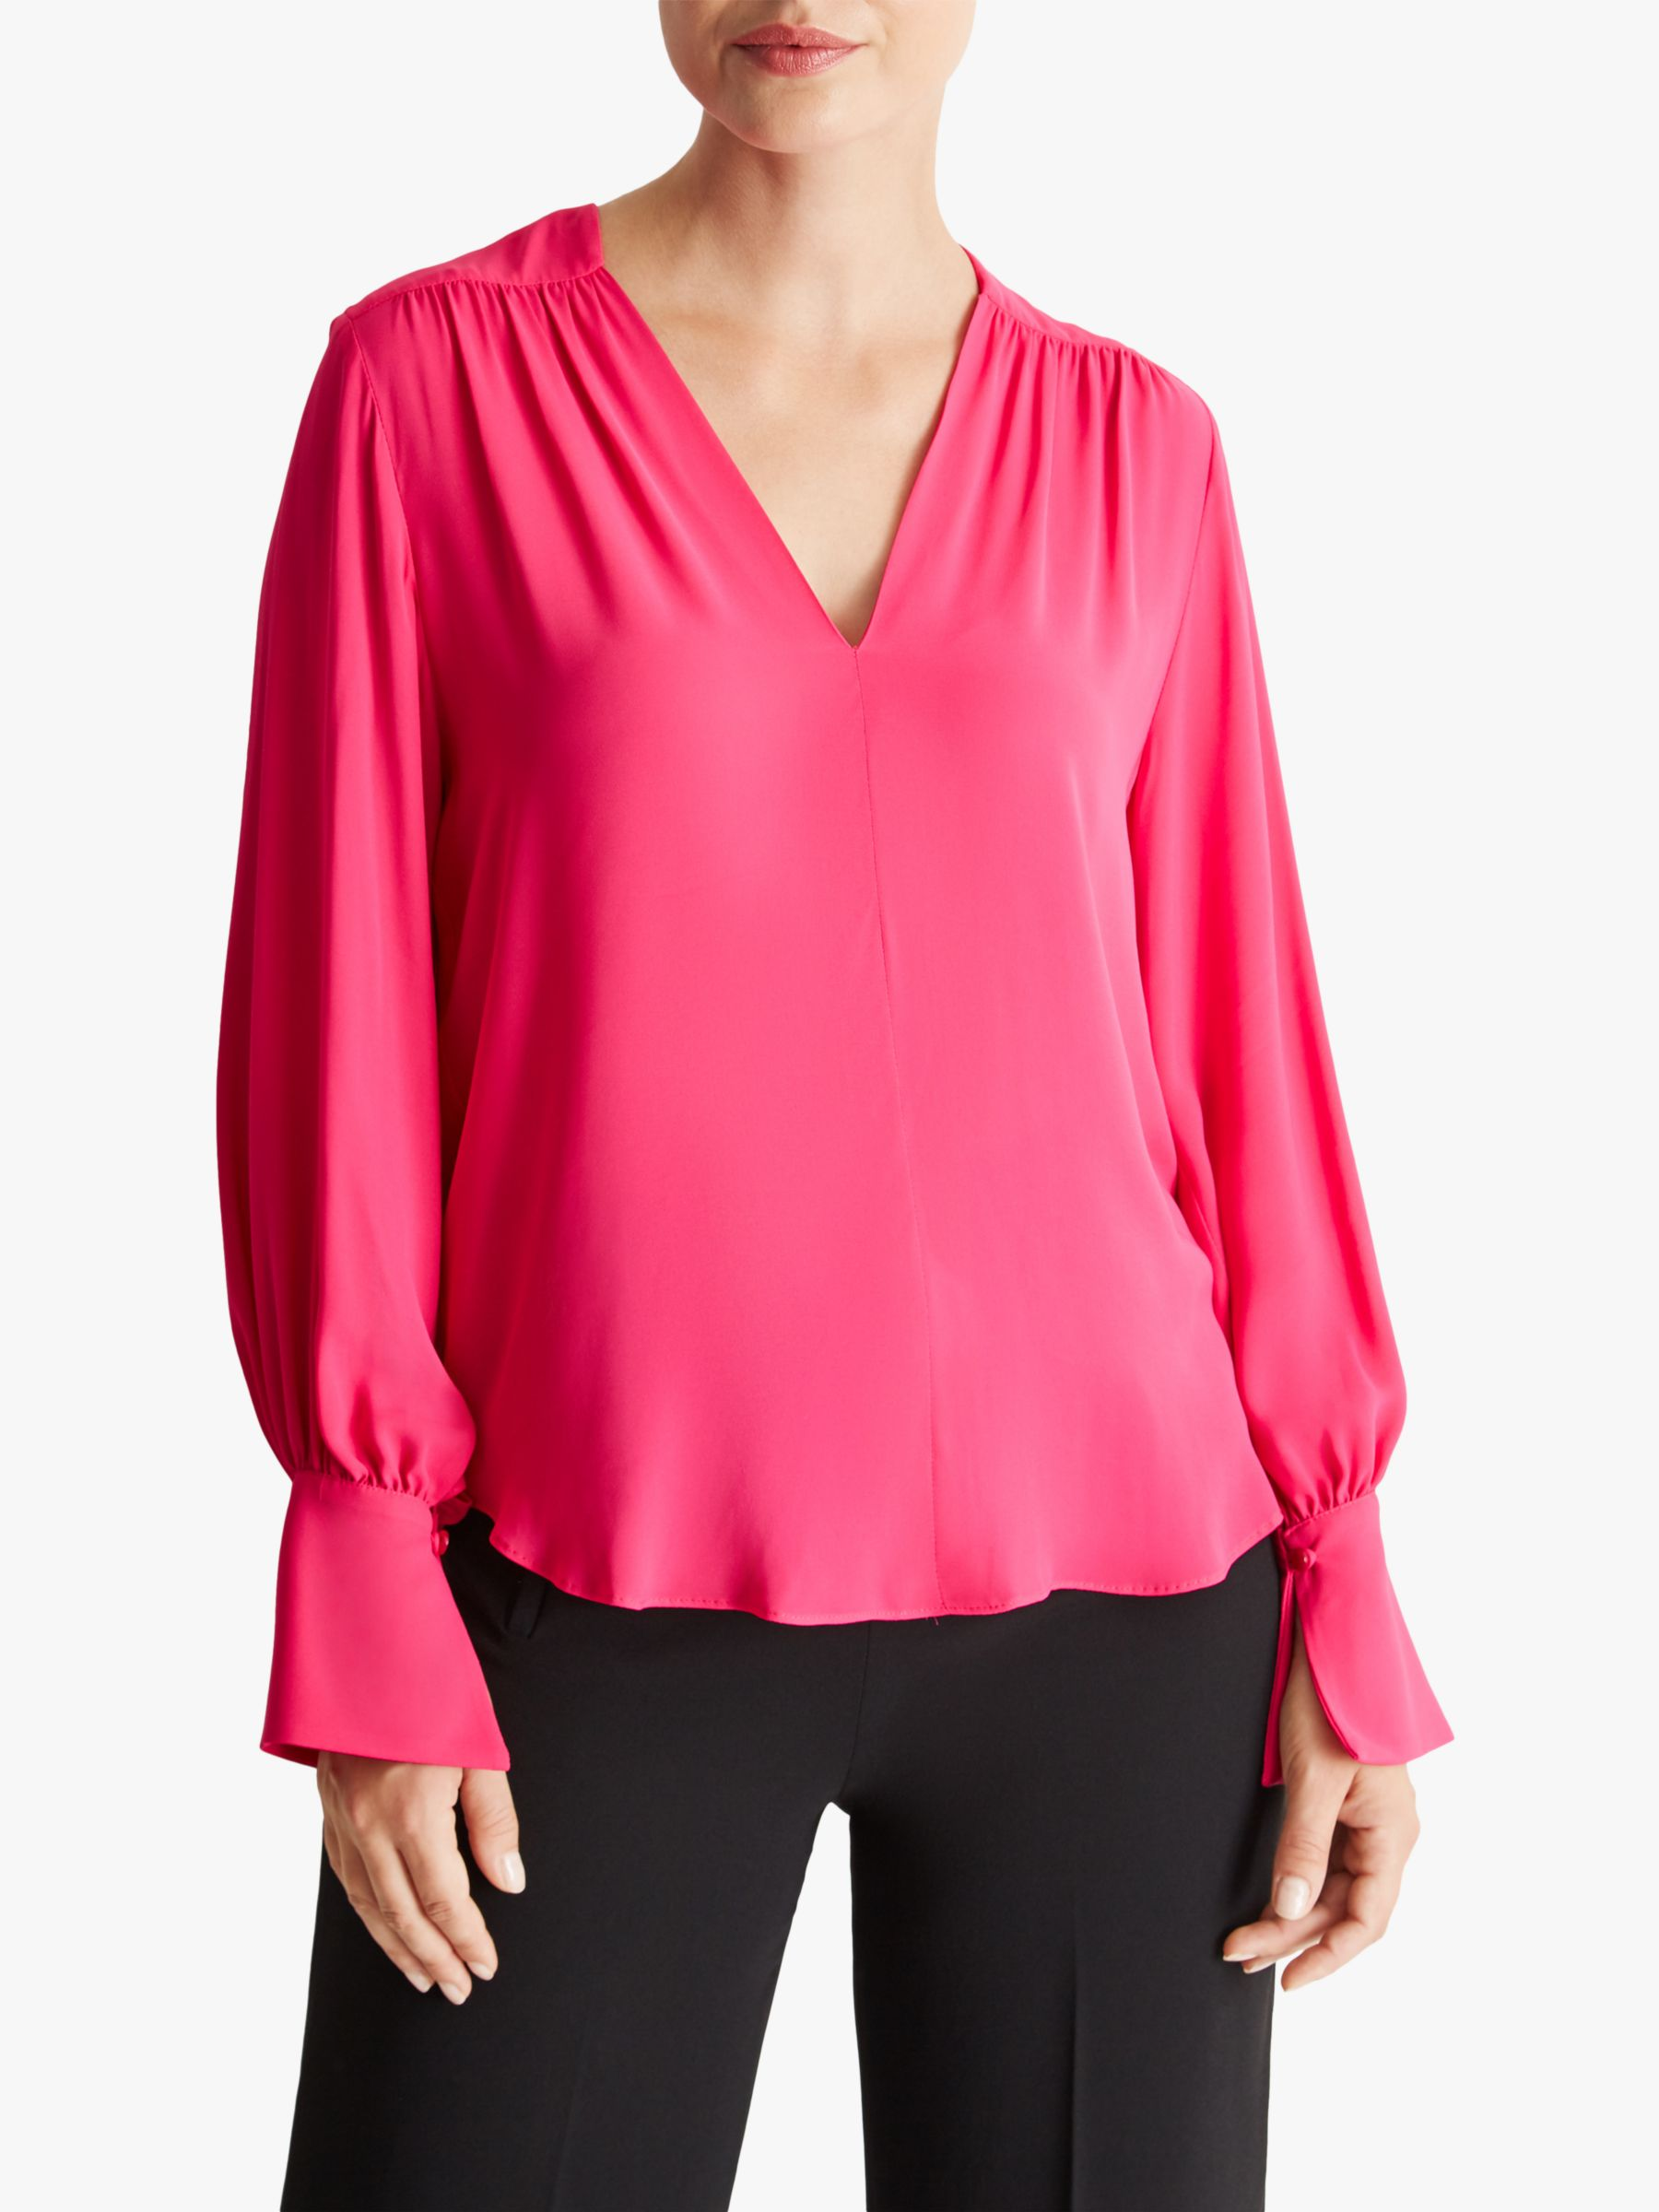 Fenn Wright Manson Fenn Wright Manson Fleuretta Long Sleeve Blouse, Pink